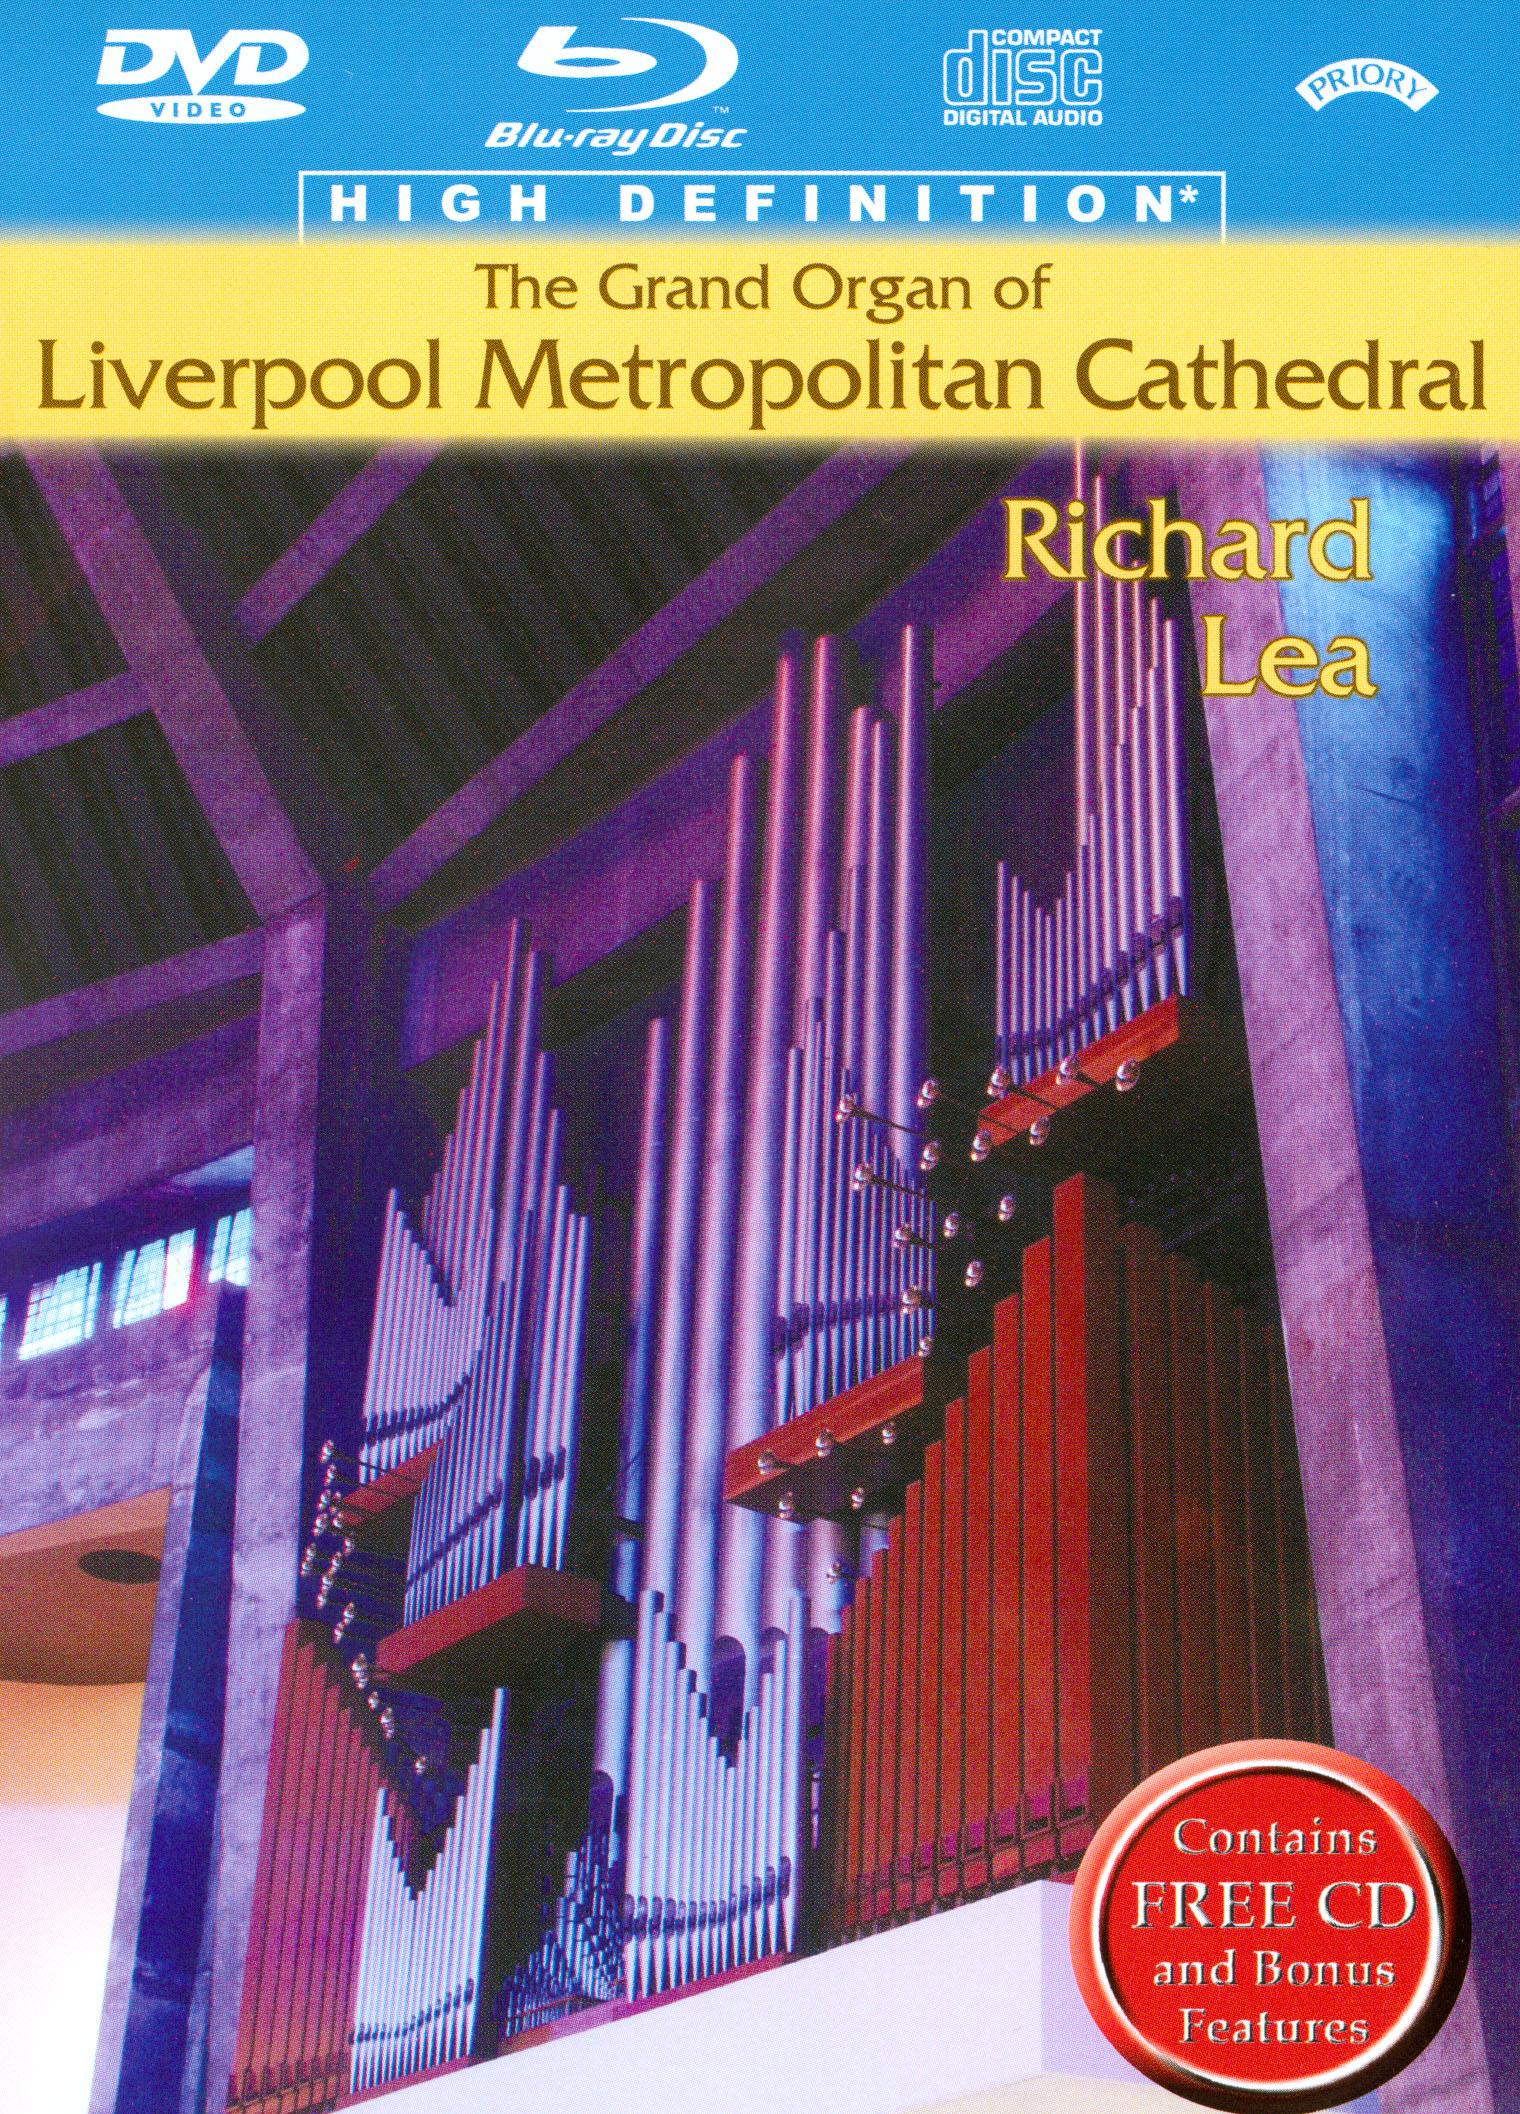 Richard Lea: The Grand Organ of Liverpool Metropolitan Cathedral